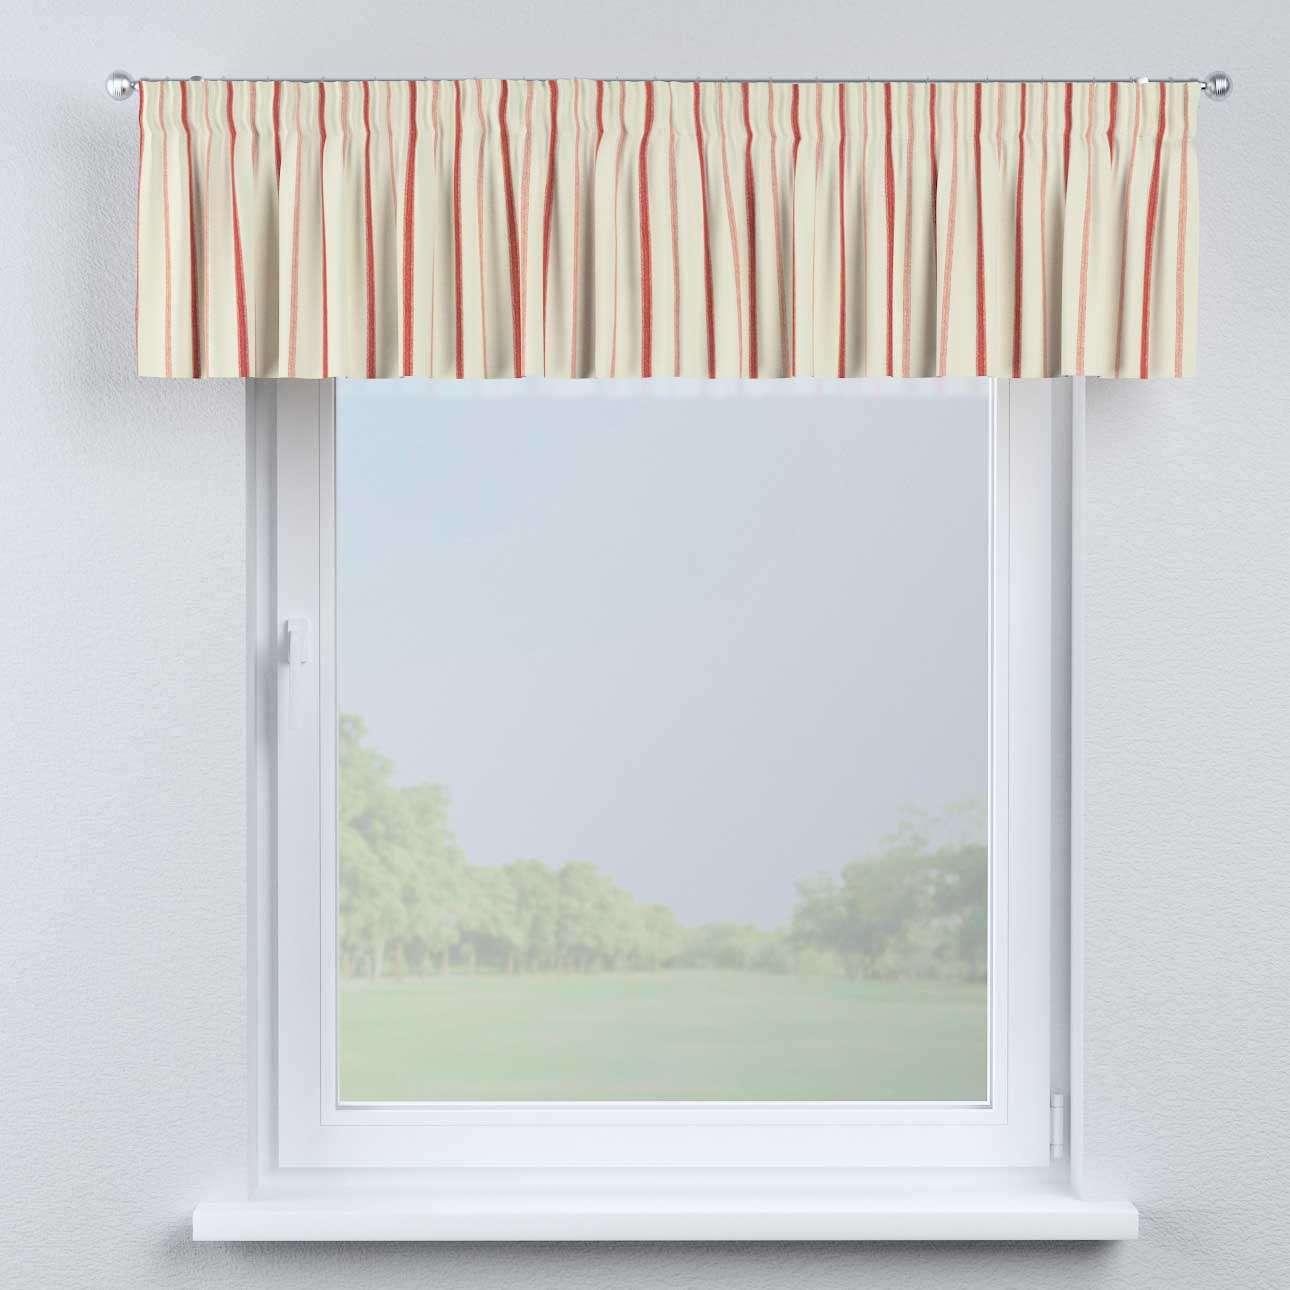 Pencil pleat pelmet 130 × 40 cm (51 × 16 inch) in collection Avinon, fabric: 129-15